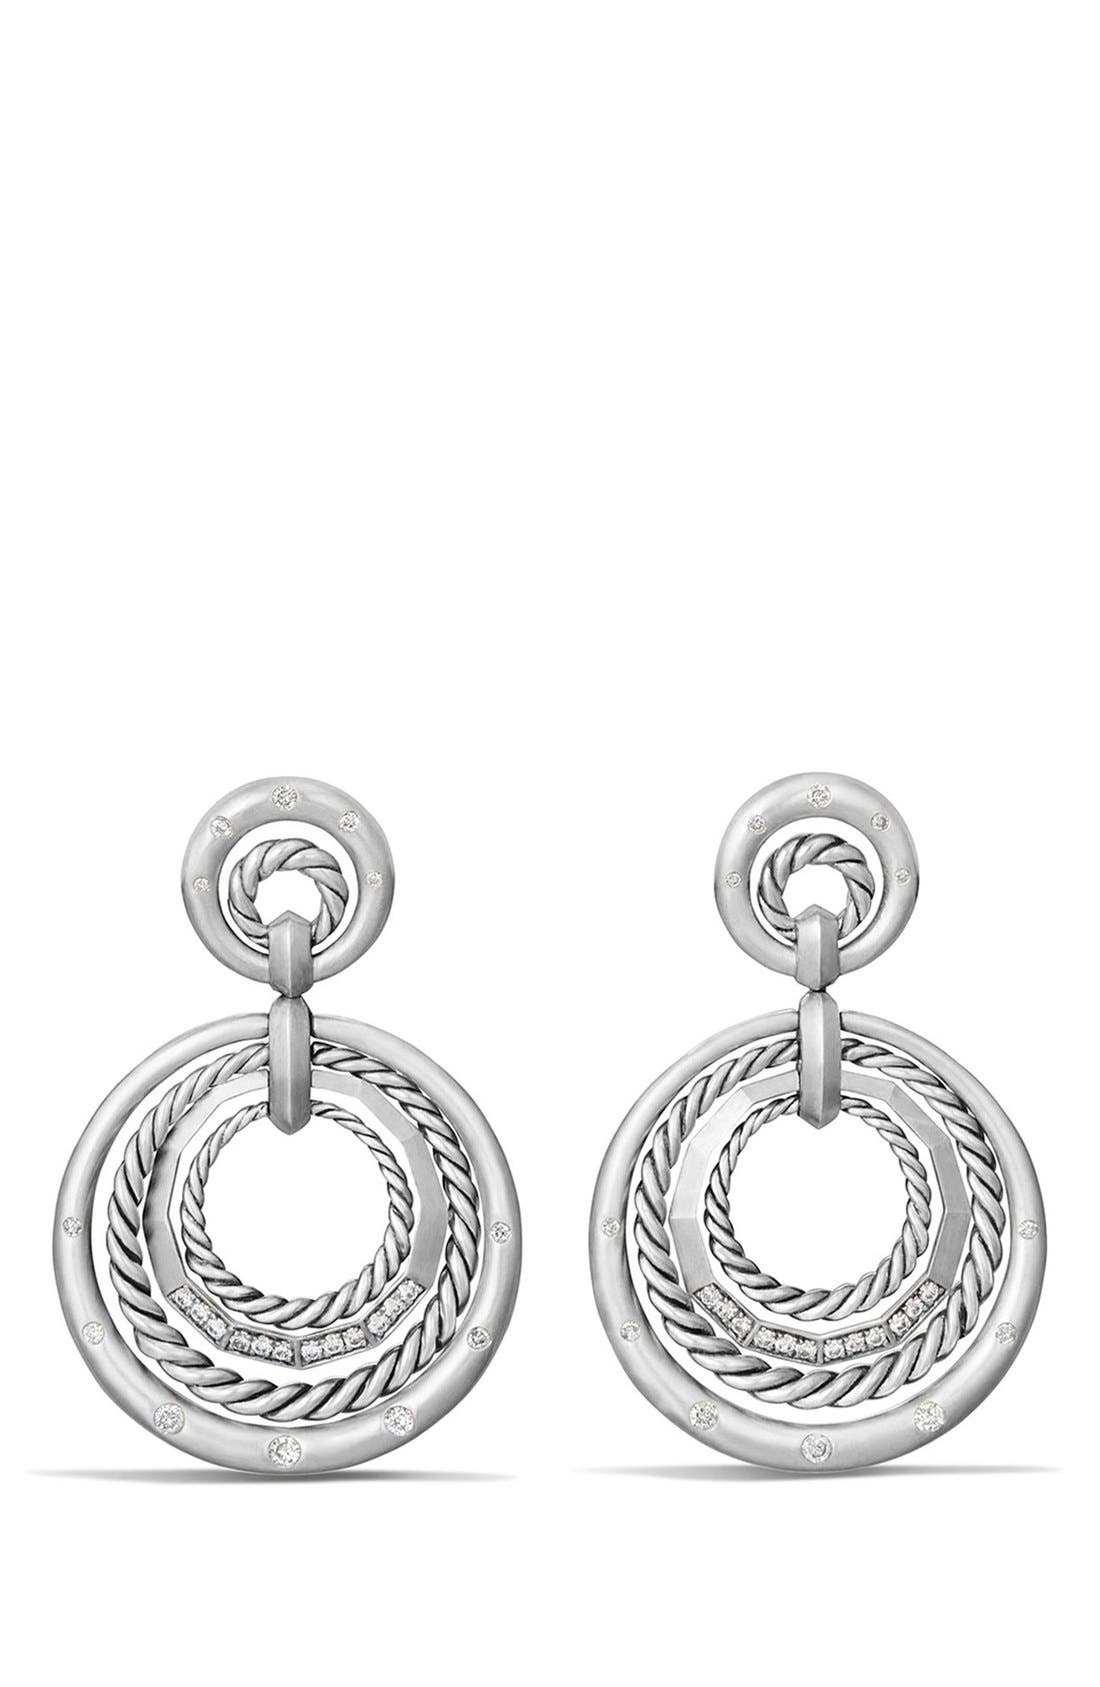 DAVID YURMAN 'Stax' Diamond Drop Earrings, Main, color, SILVER